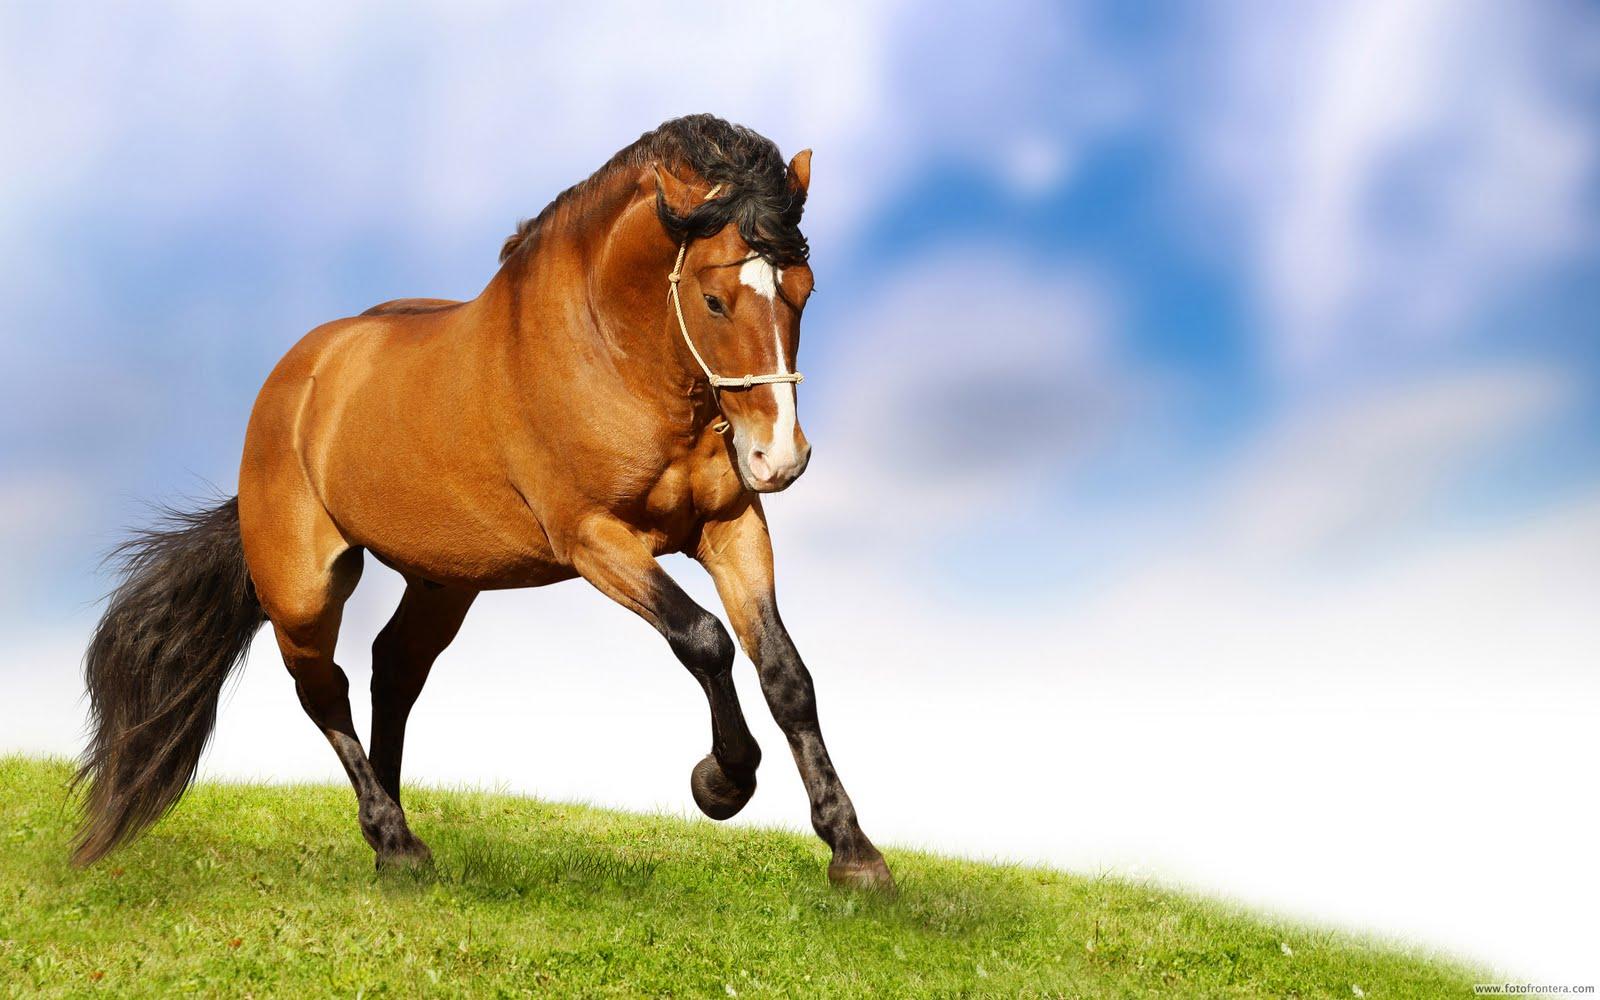 http://2.bp.blogspot.com/-pmJNrFXmpxQ/TocQGnuB7eI/AAAAAAAADM0/c78KuC1pC18/s1600/Beautiful+horses+photos+35.jpg